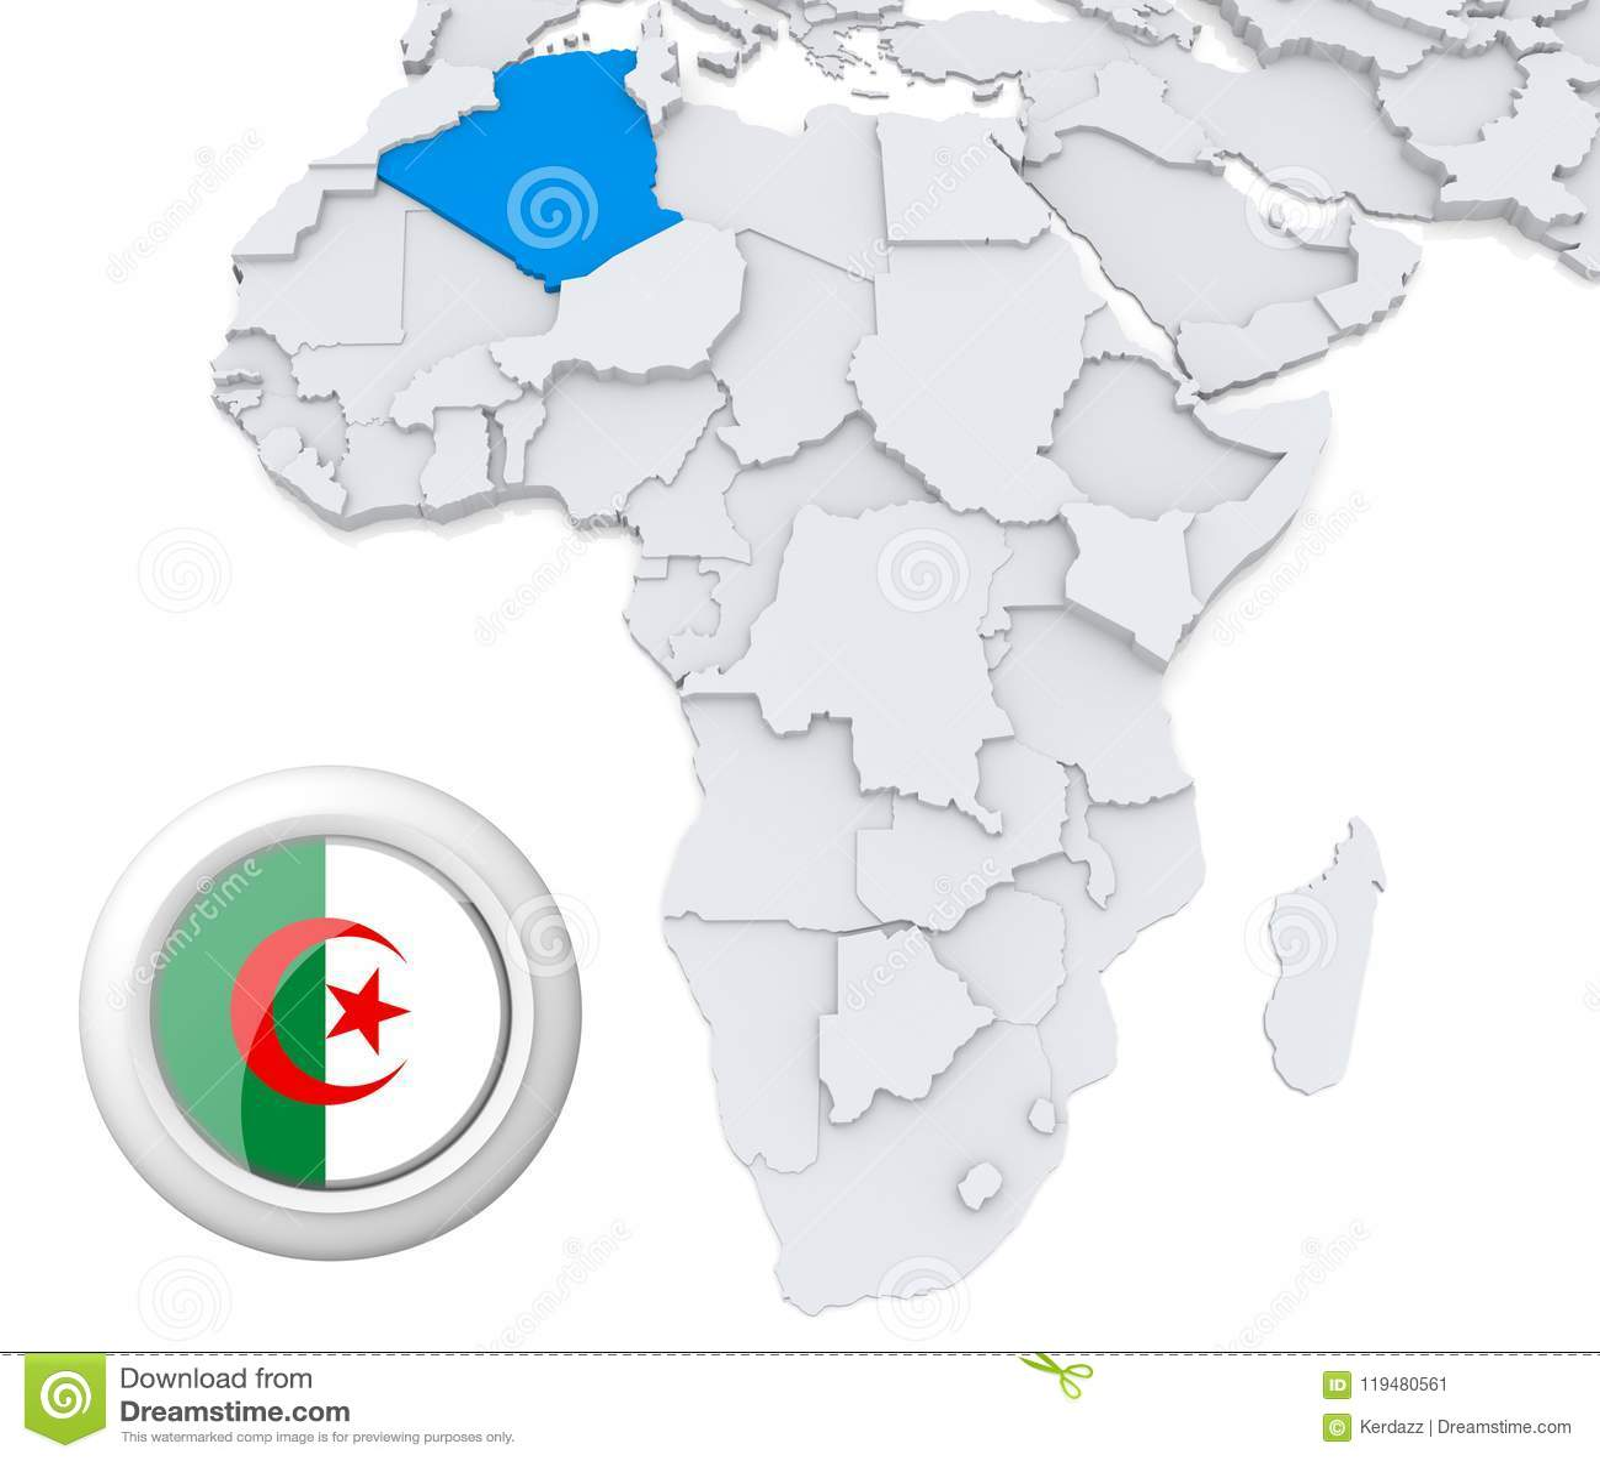 algeria on africa map Algeria On Africa Map Stock Illustration Illustration Of Global algeria on africa map